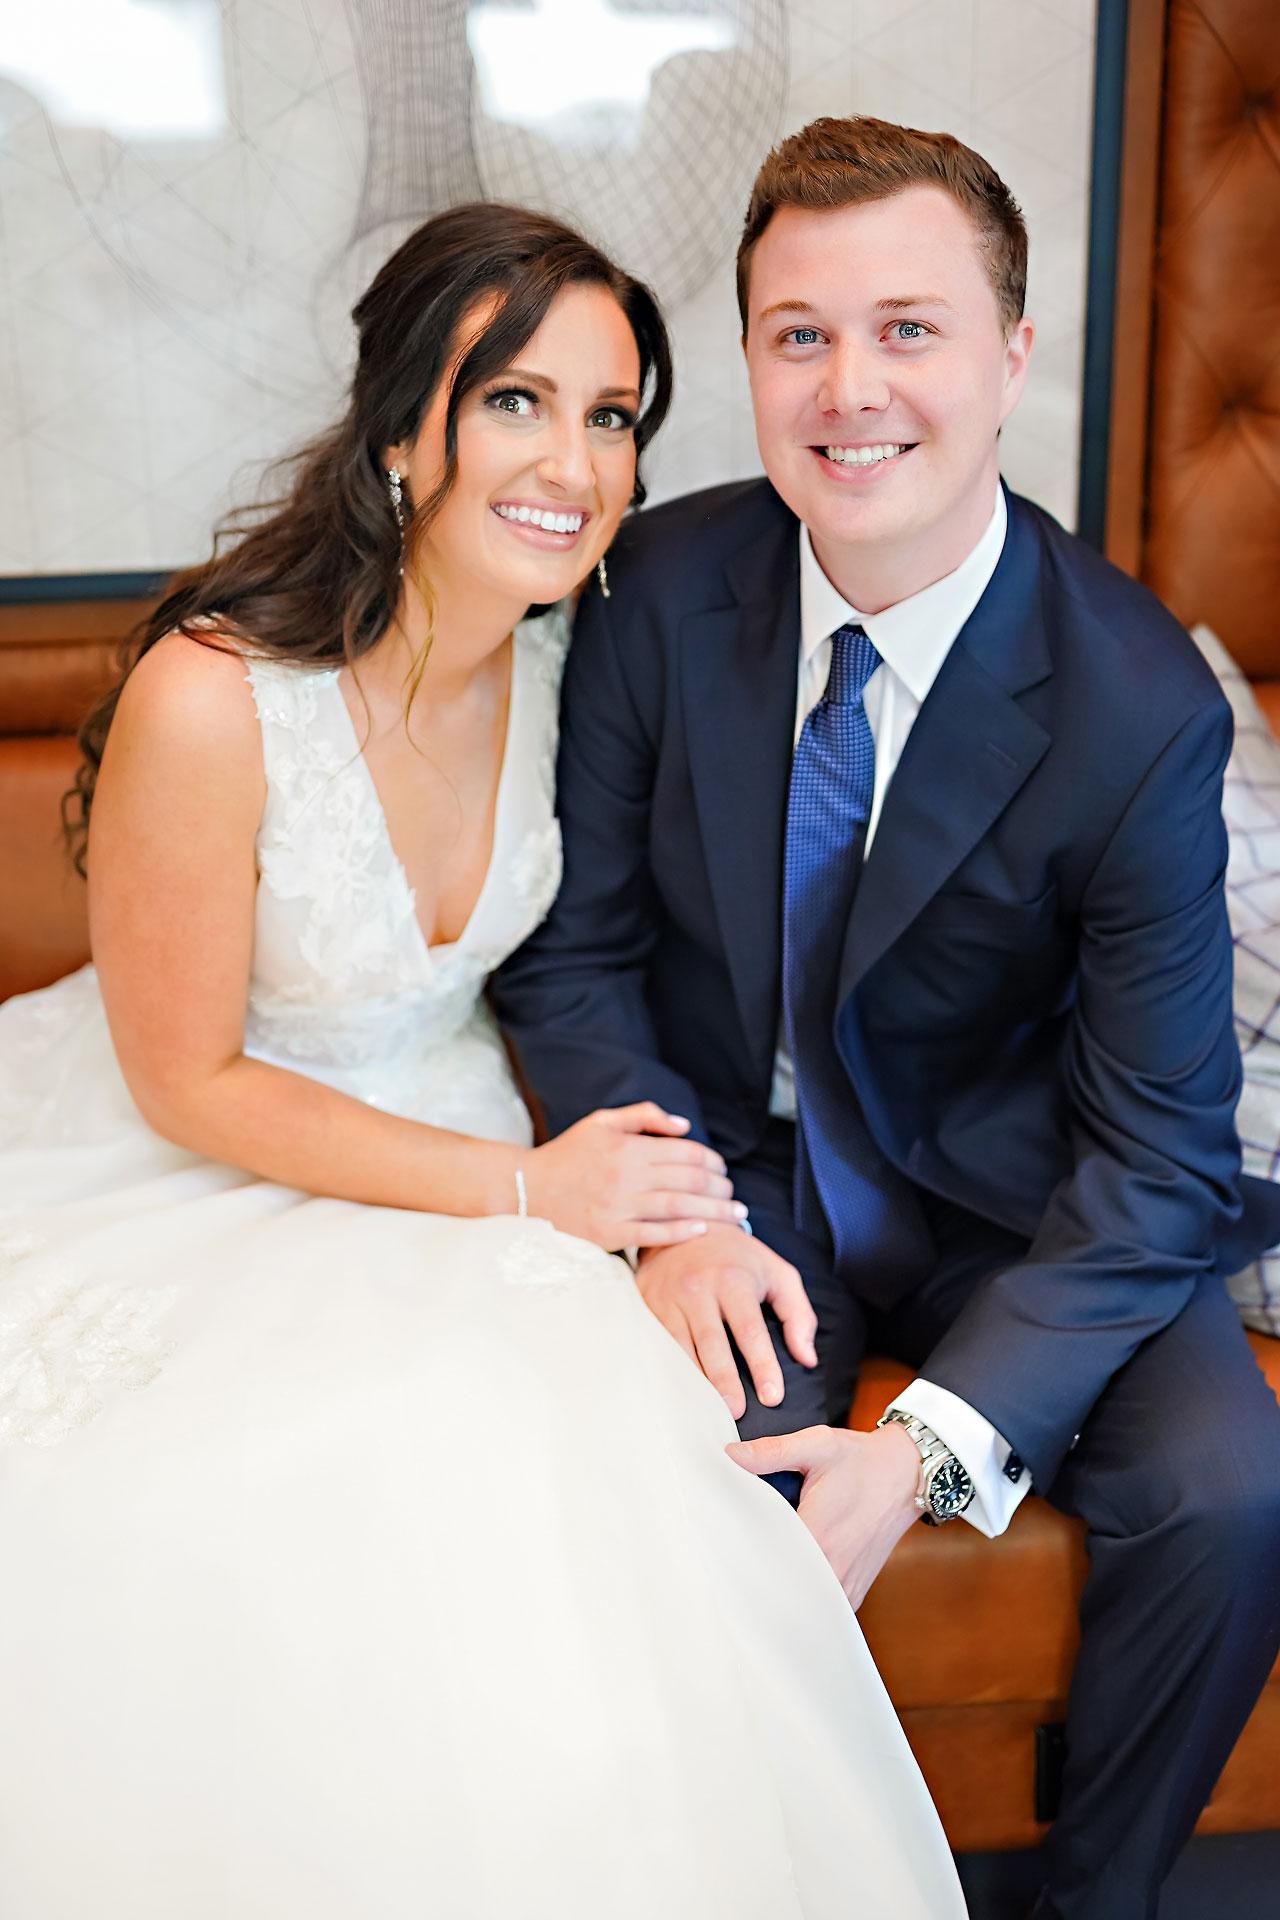 MacKinze John Lafayette Indiana Purdue Wedding 061